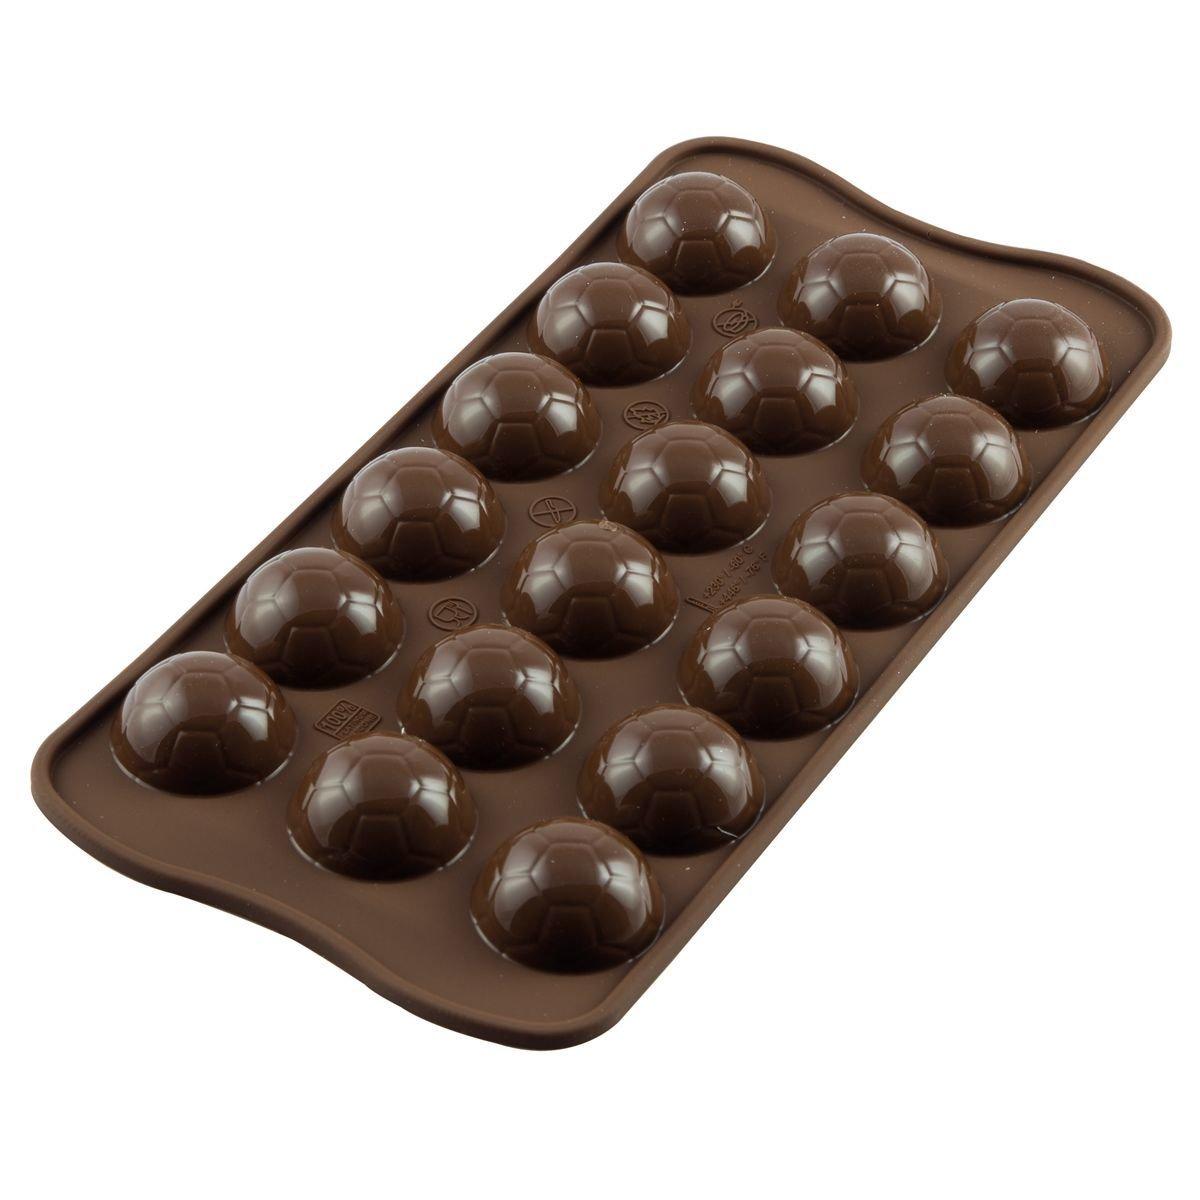 SALE!!! Silikomart Chocolate Mould Choco Goal - Καλούπι Σοκολάτας Ποδοσφαιρική Μπάλα - 2.7x1.35εκ